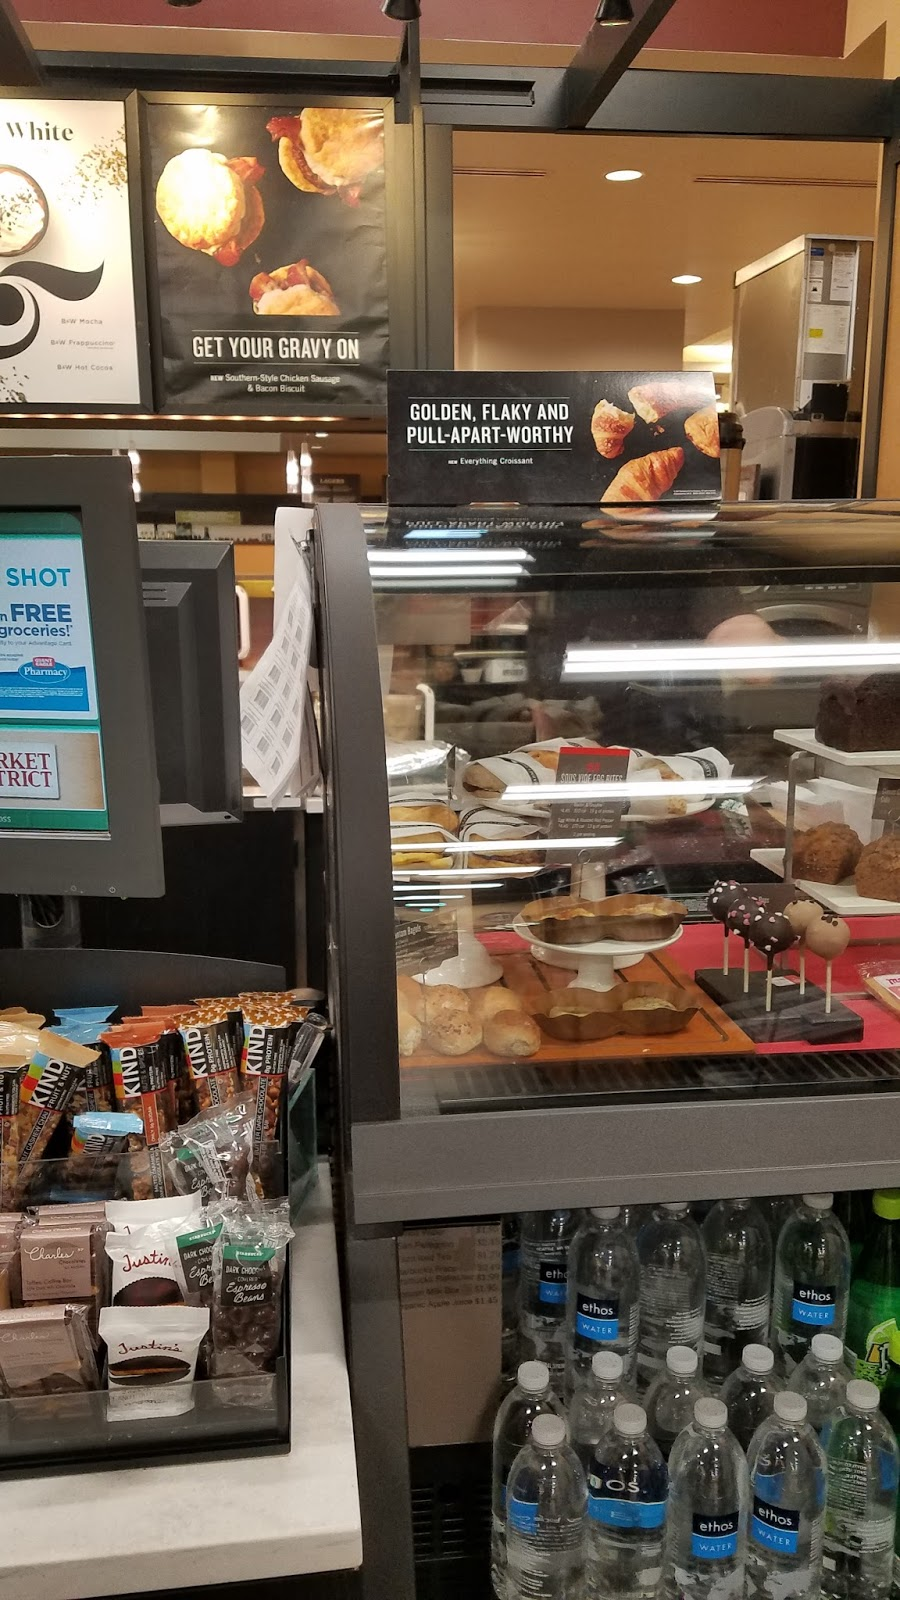 Starbucks - cafe  | Photo 2 of 5 | Address: 7000 Oxford Dr, Bethel Park, PA 15102, USA | Phone: (412) 831-1480